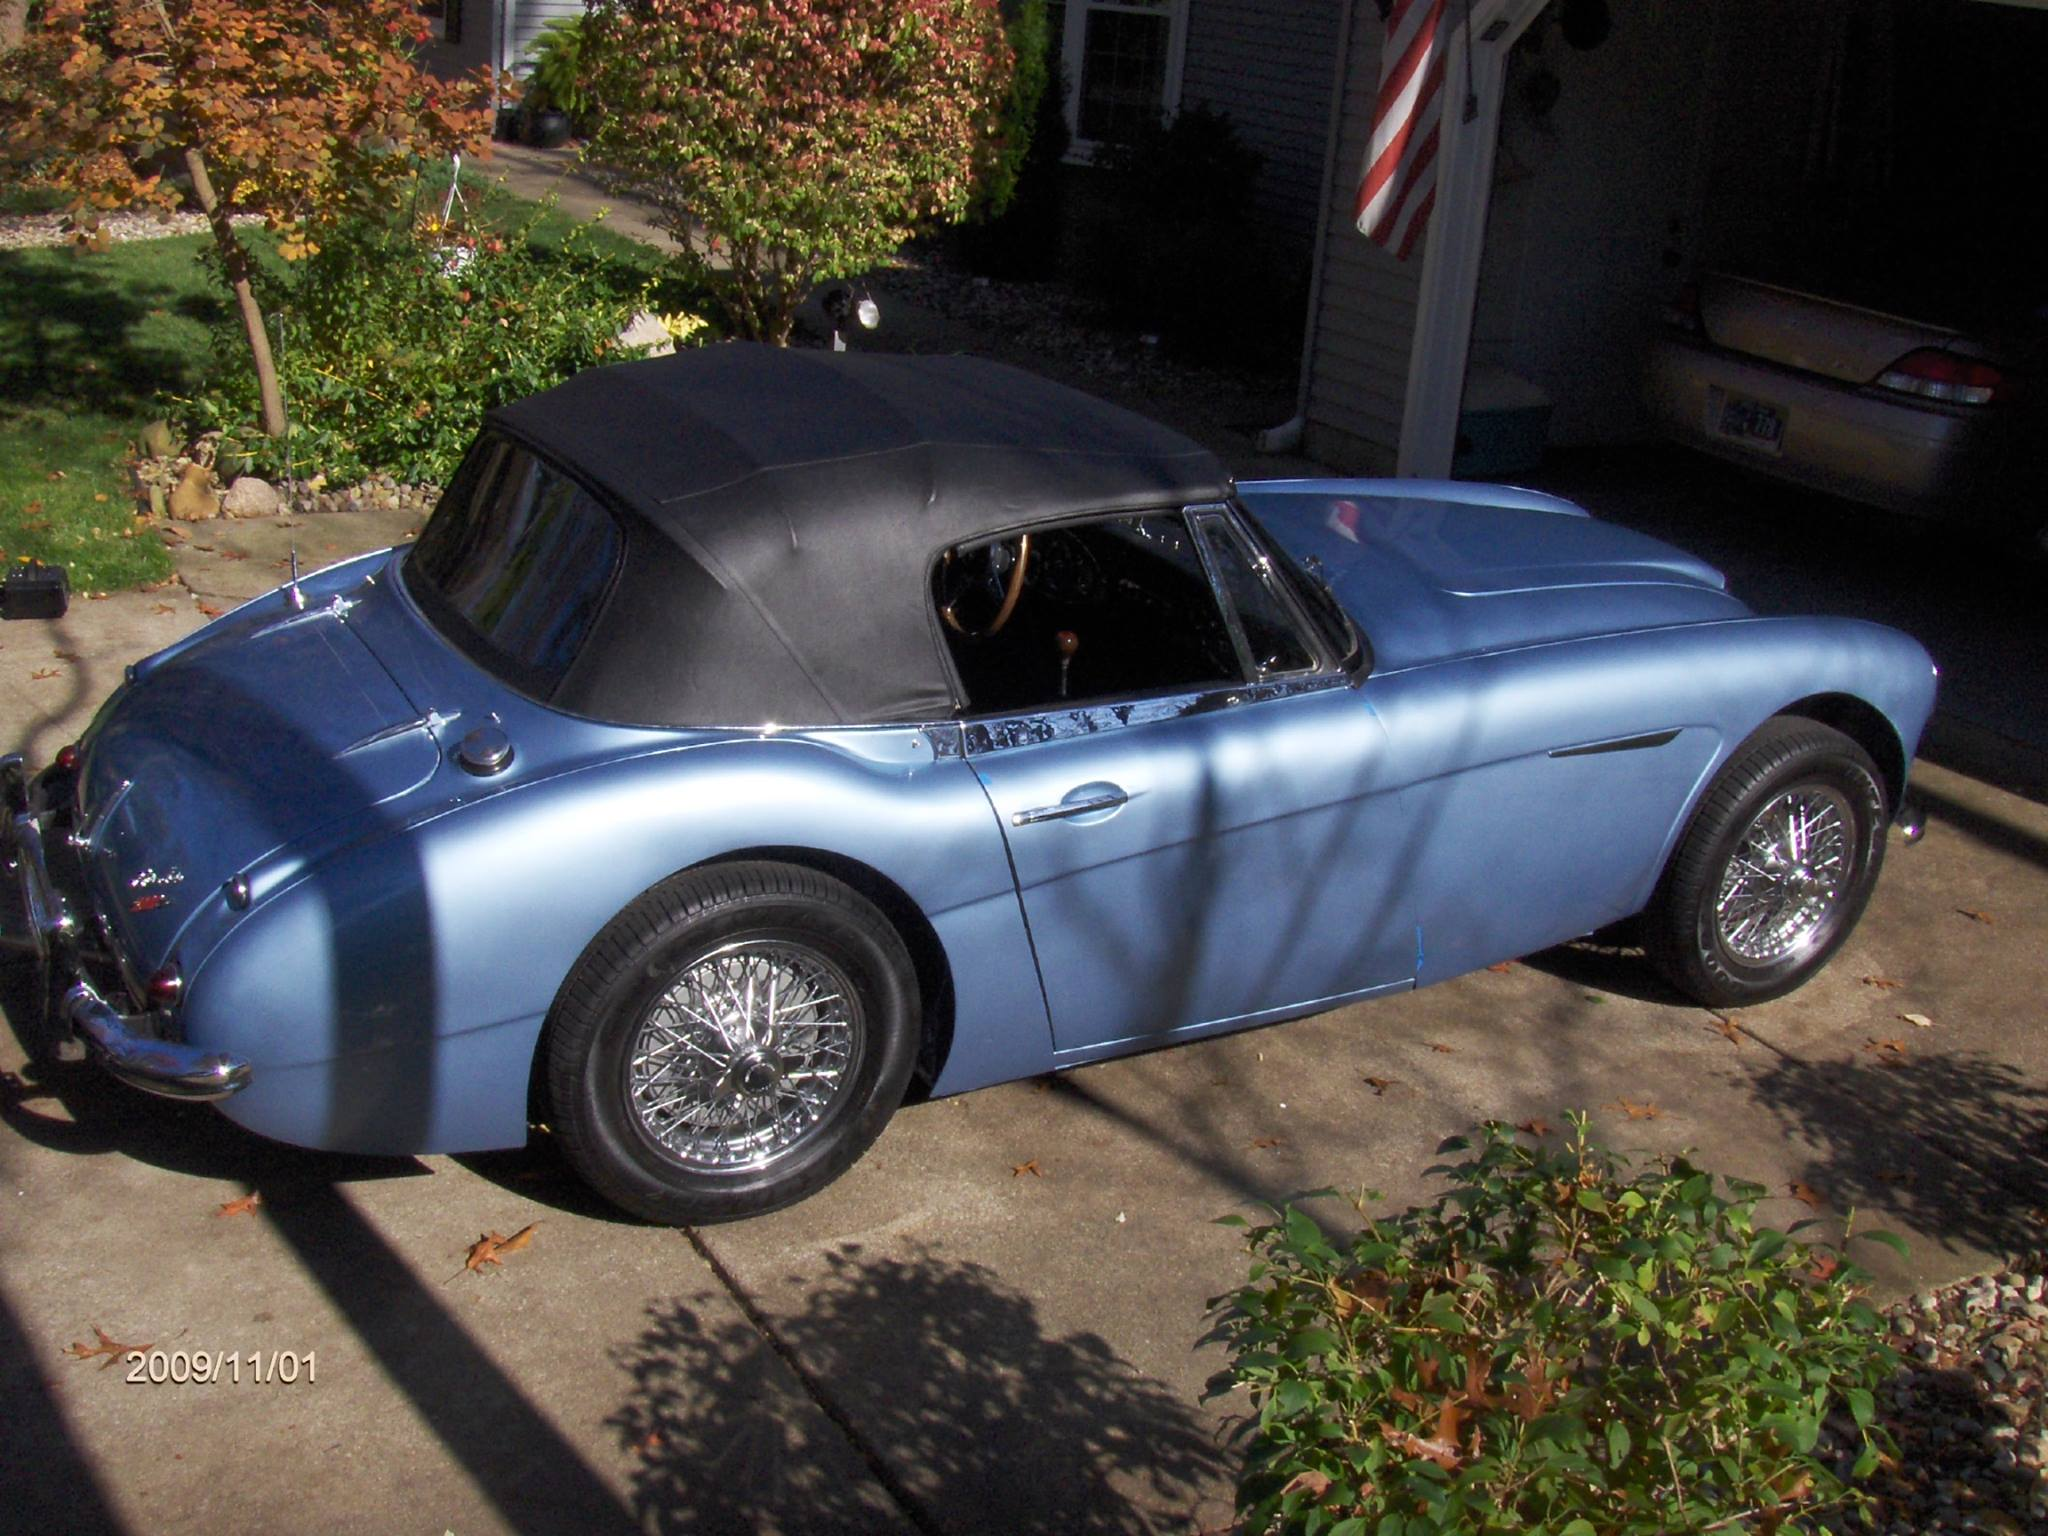 1964-Austin-Healey-3000-MKII-BJ7-2